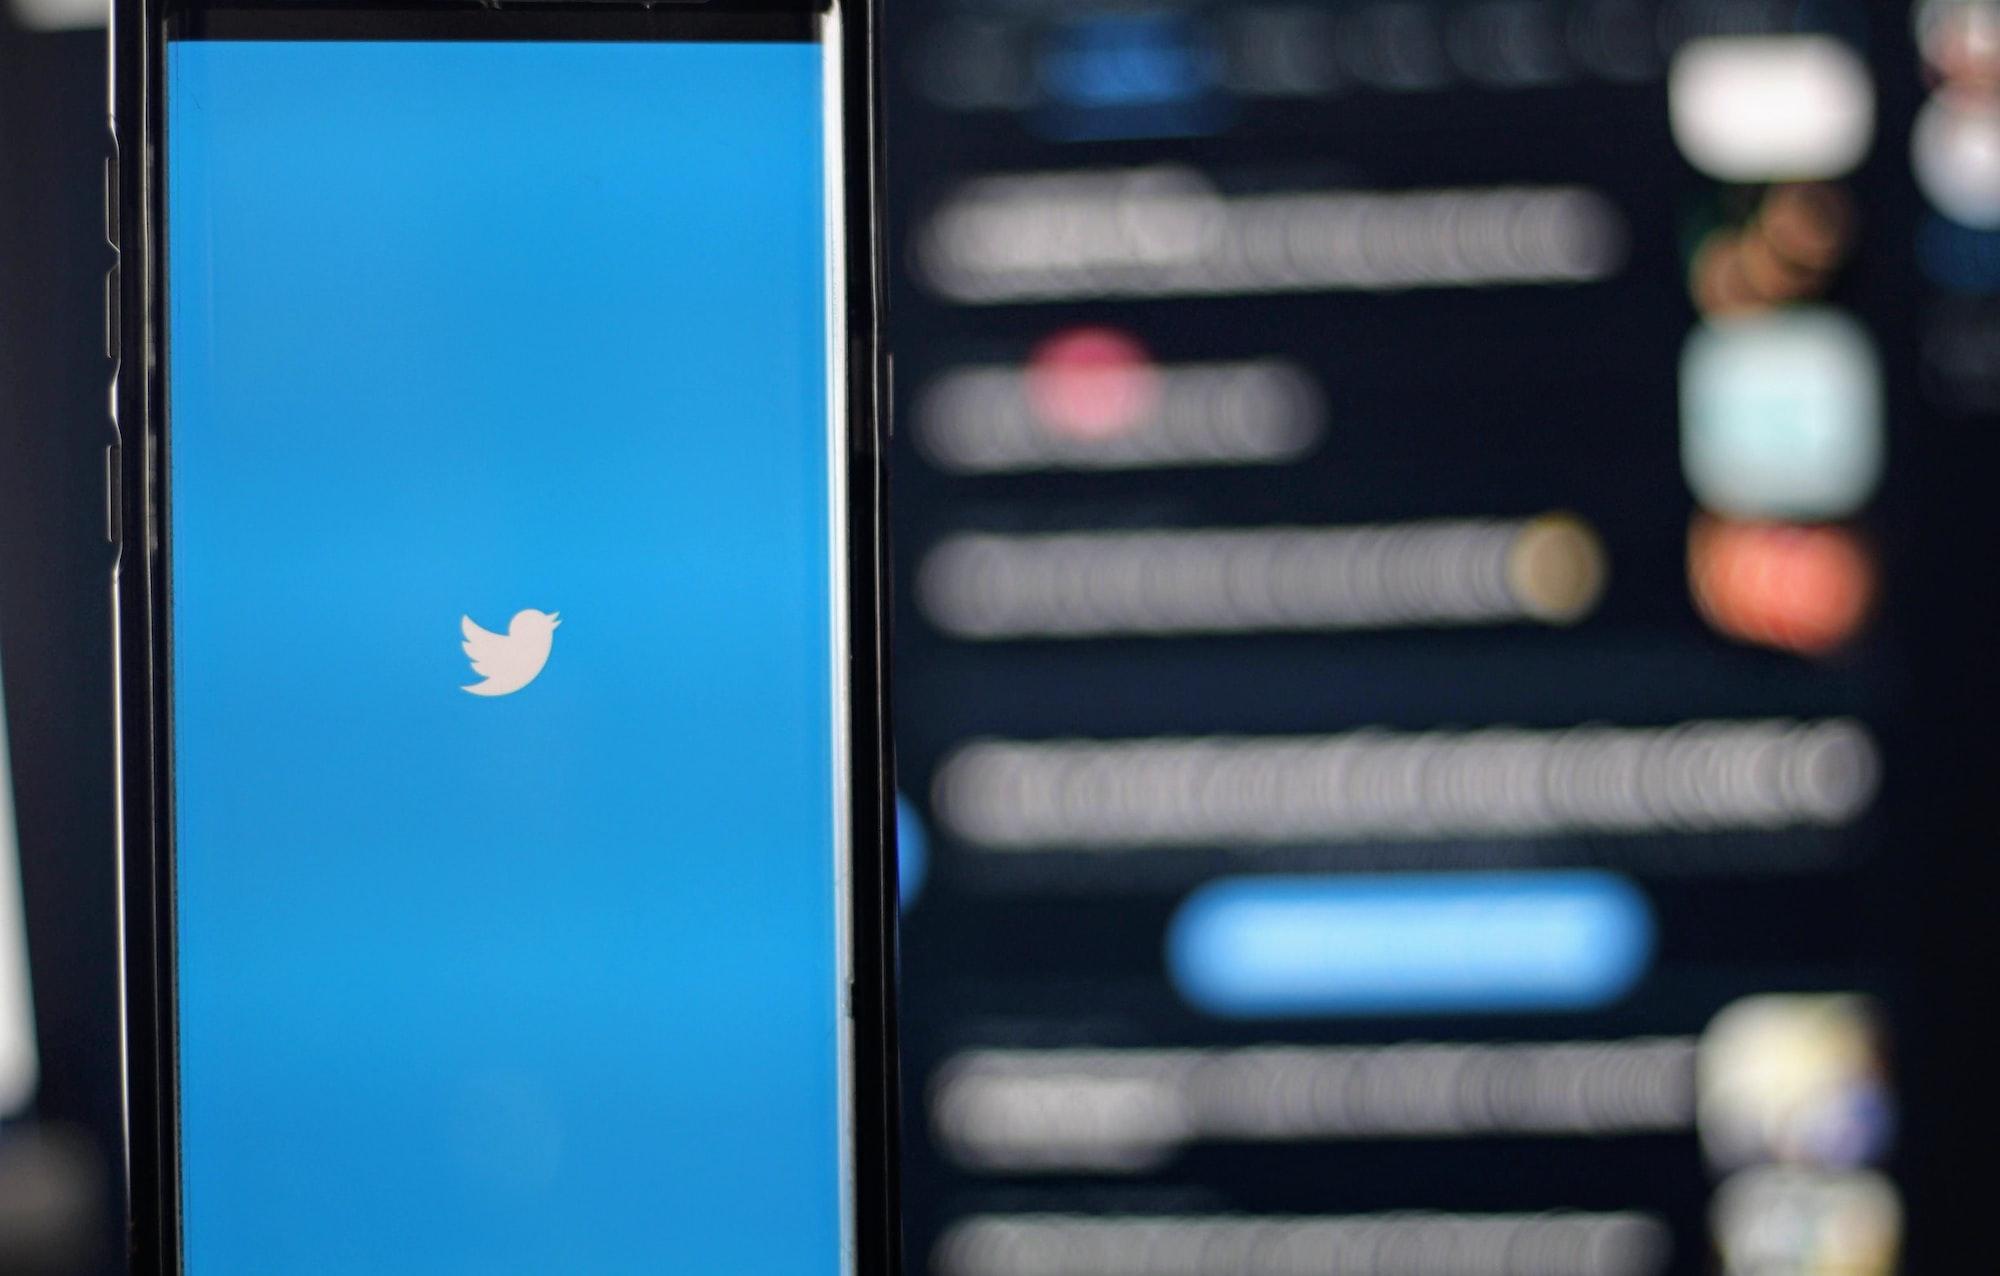 Twitter Splash screen